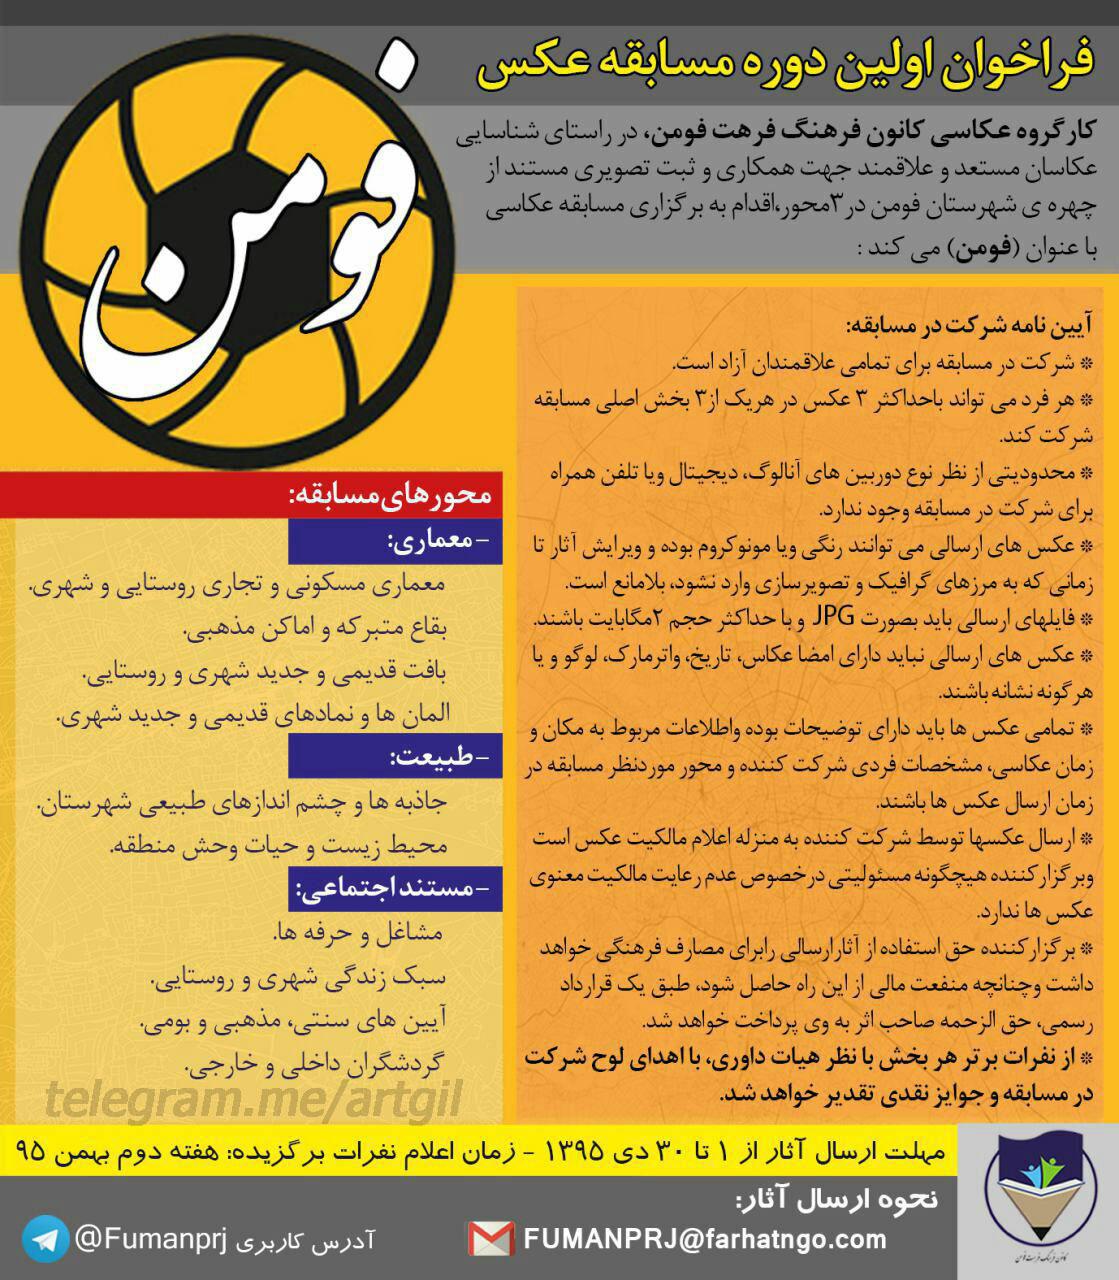 فراخوان اولین دوره مسابقه عکس فومن